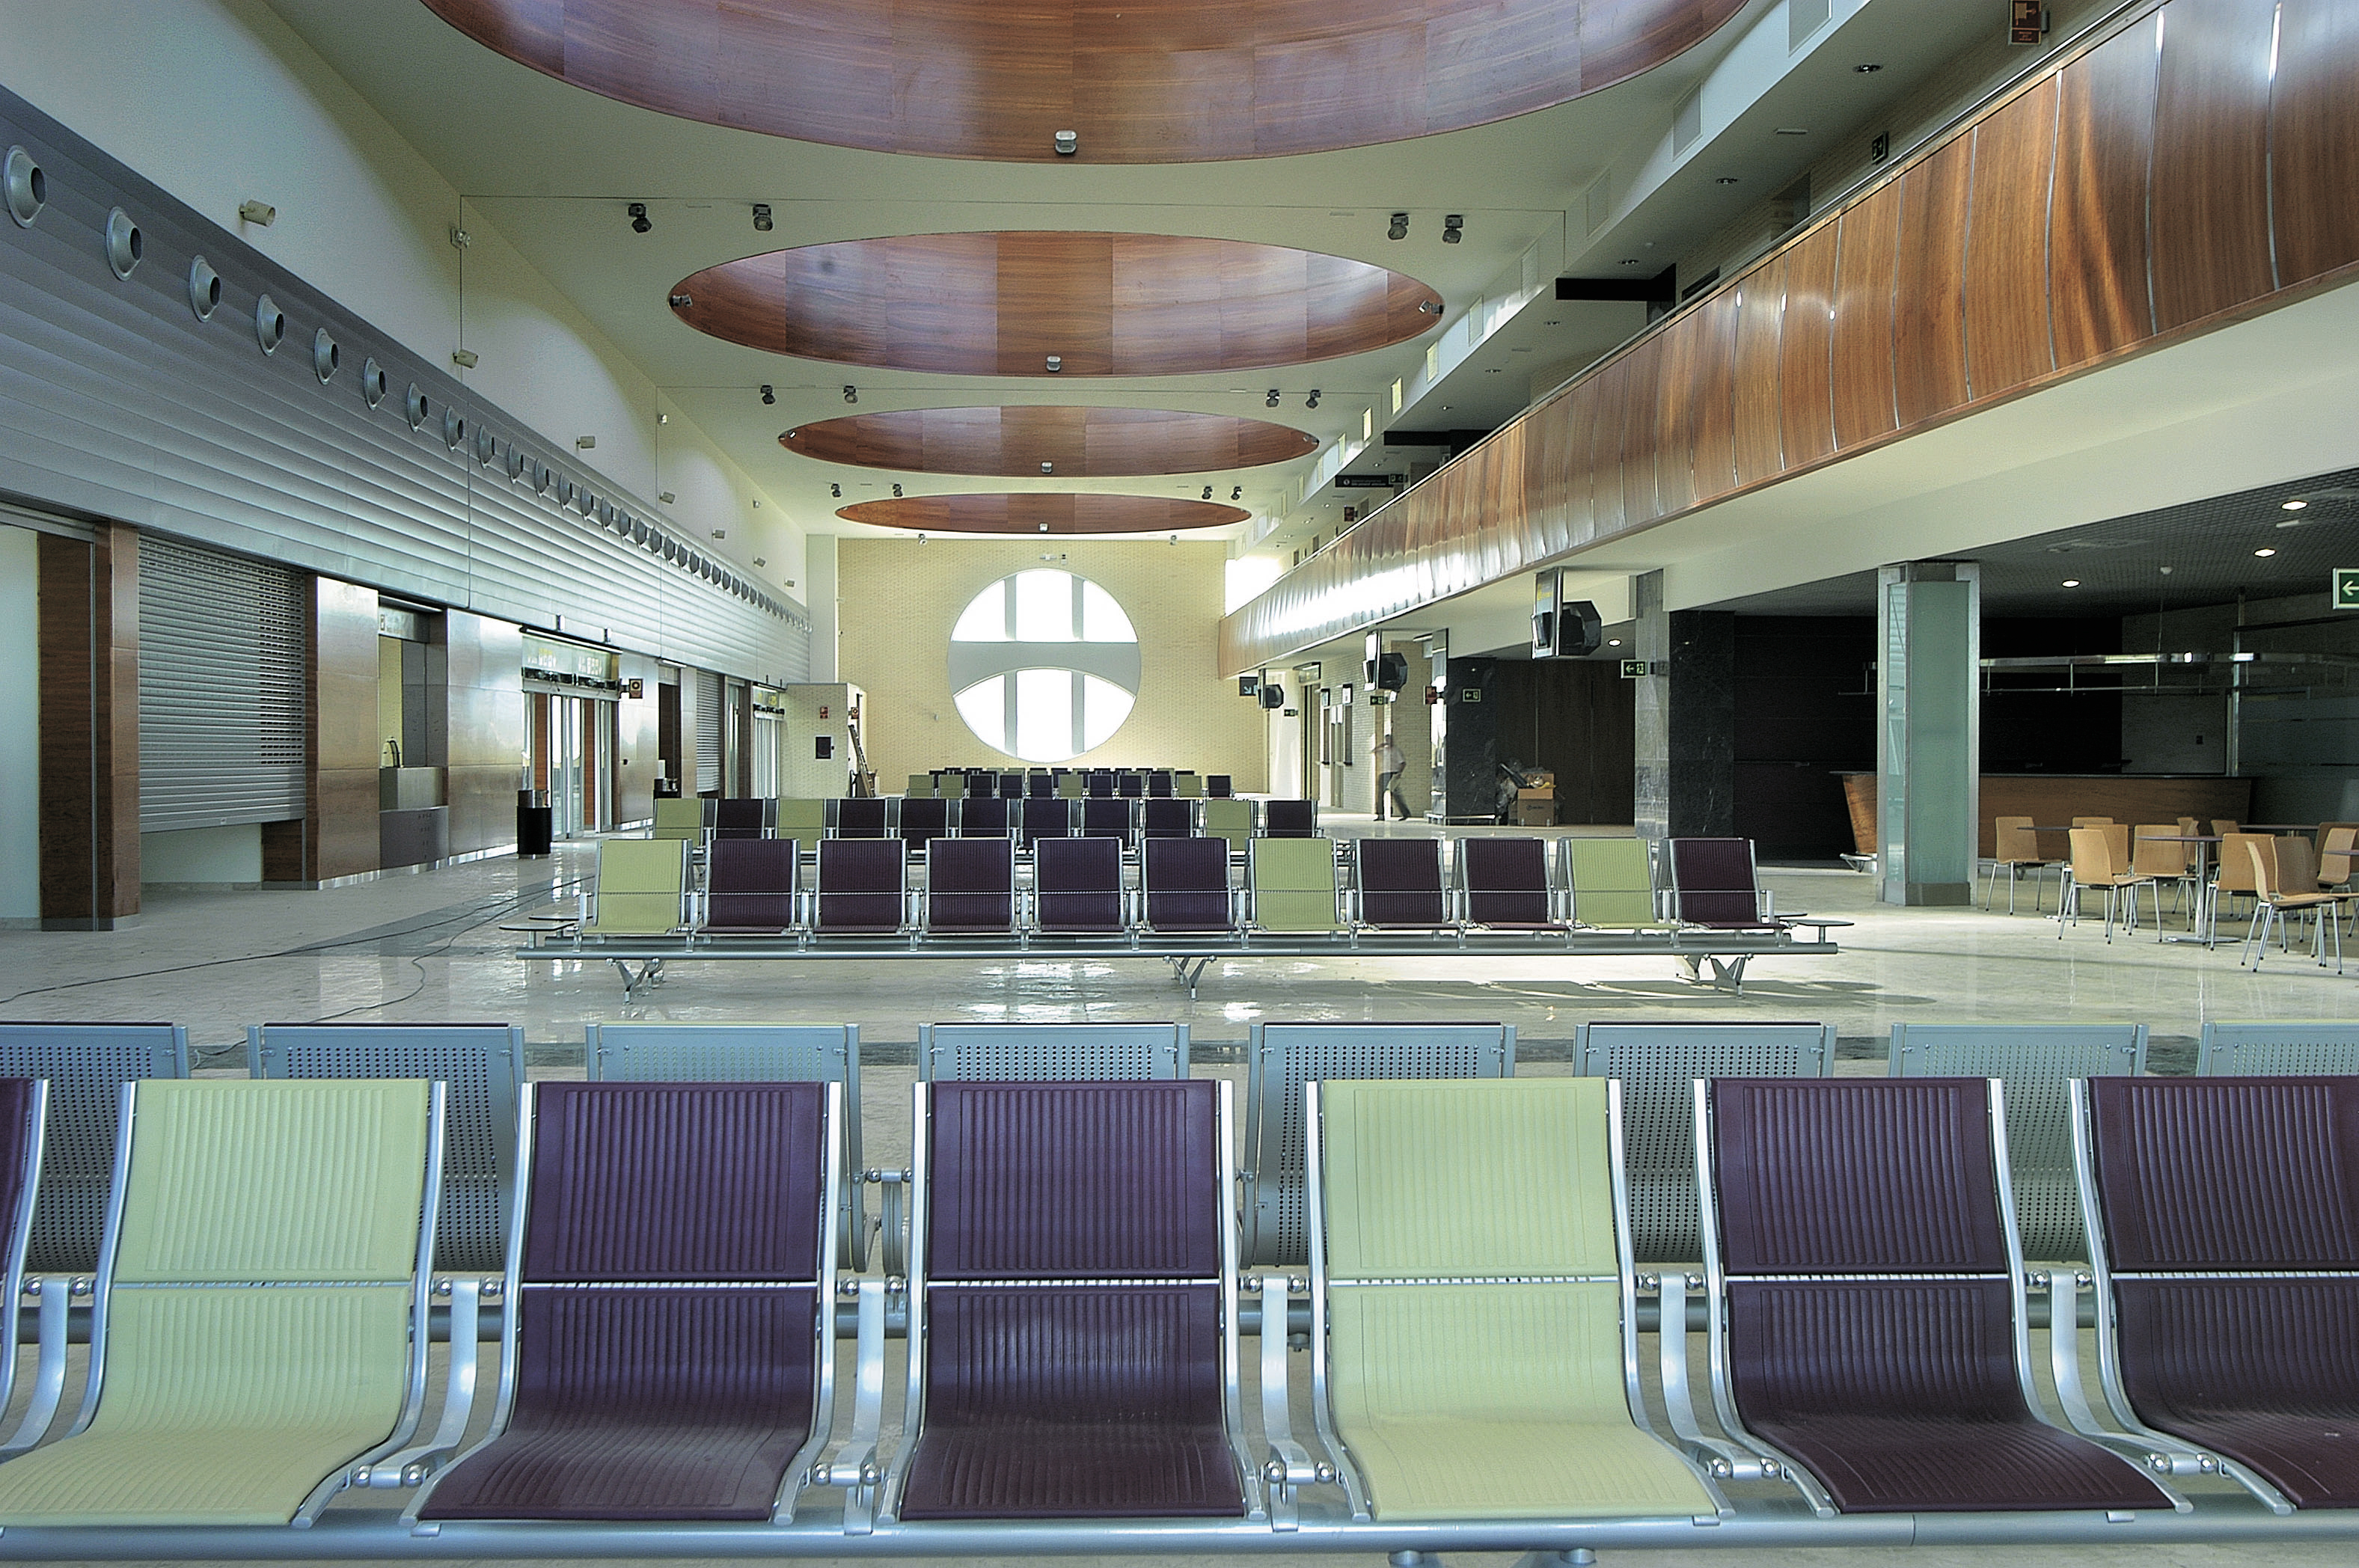 Aeropuerto Logroño interiores